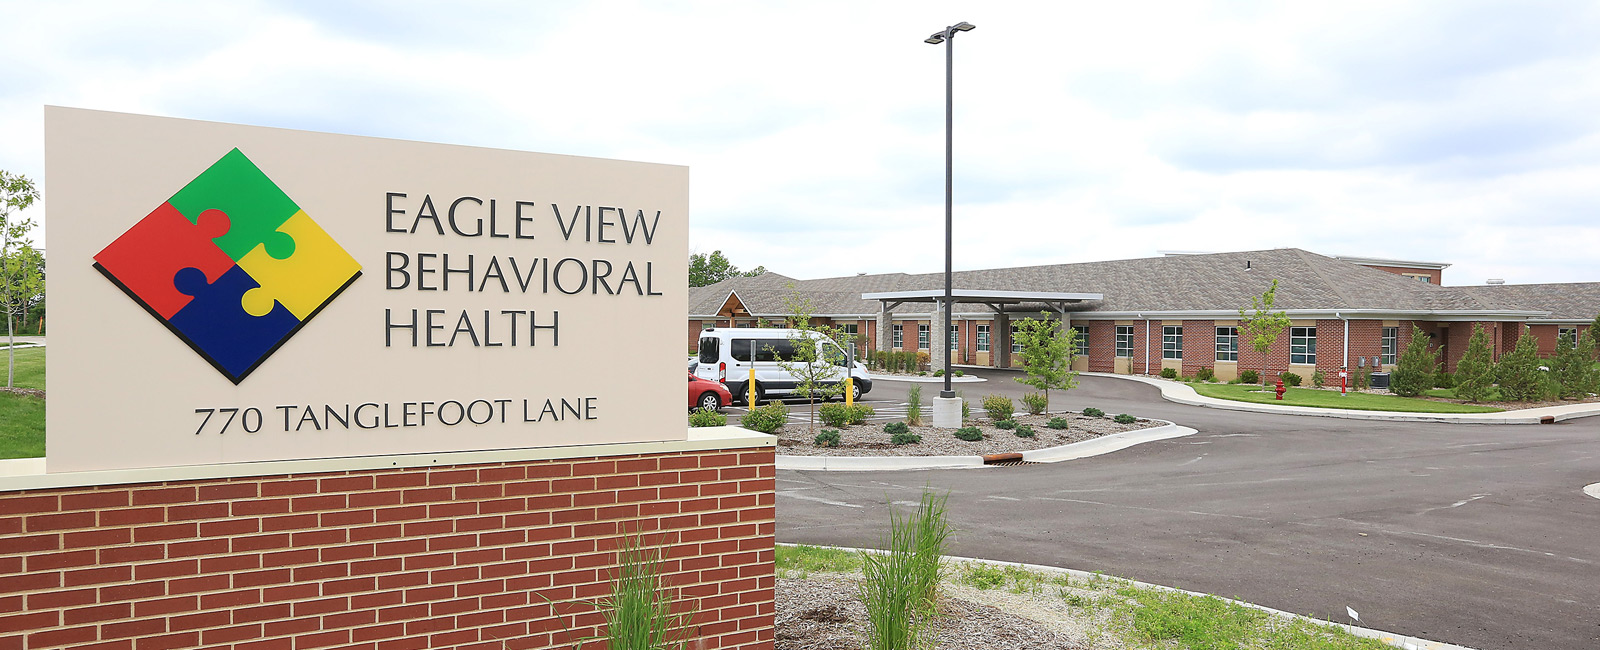 Eagle View Behavioral Health Facility